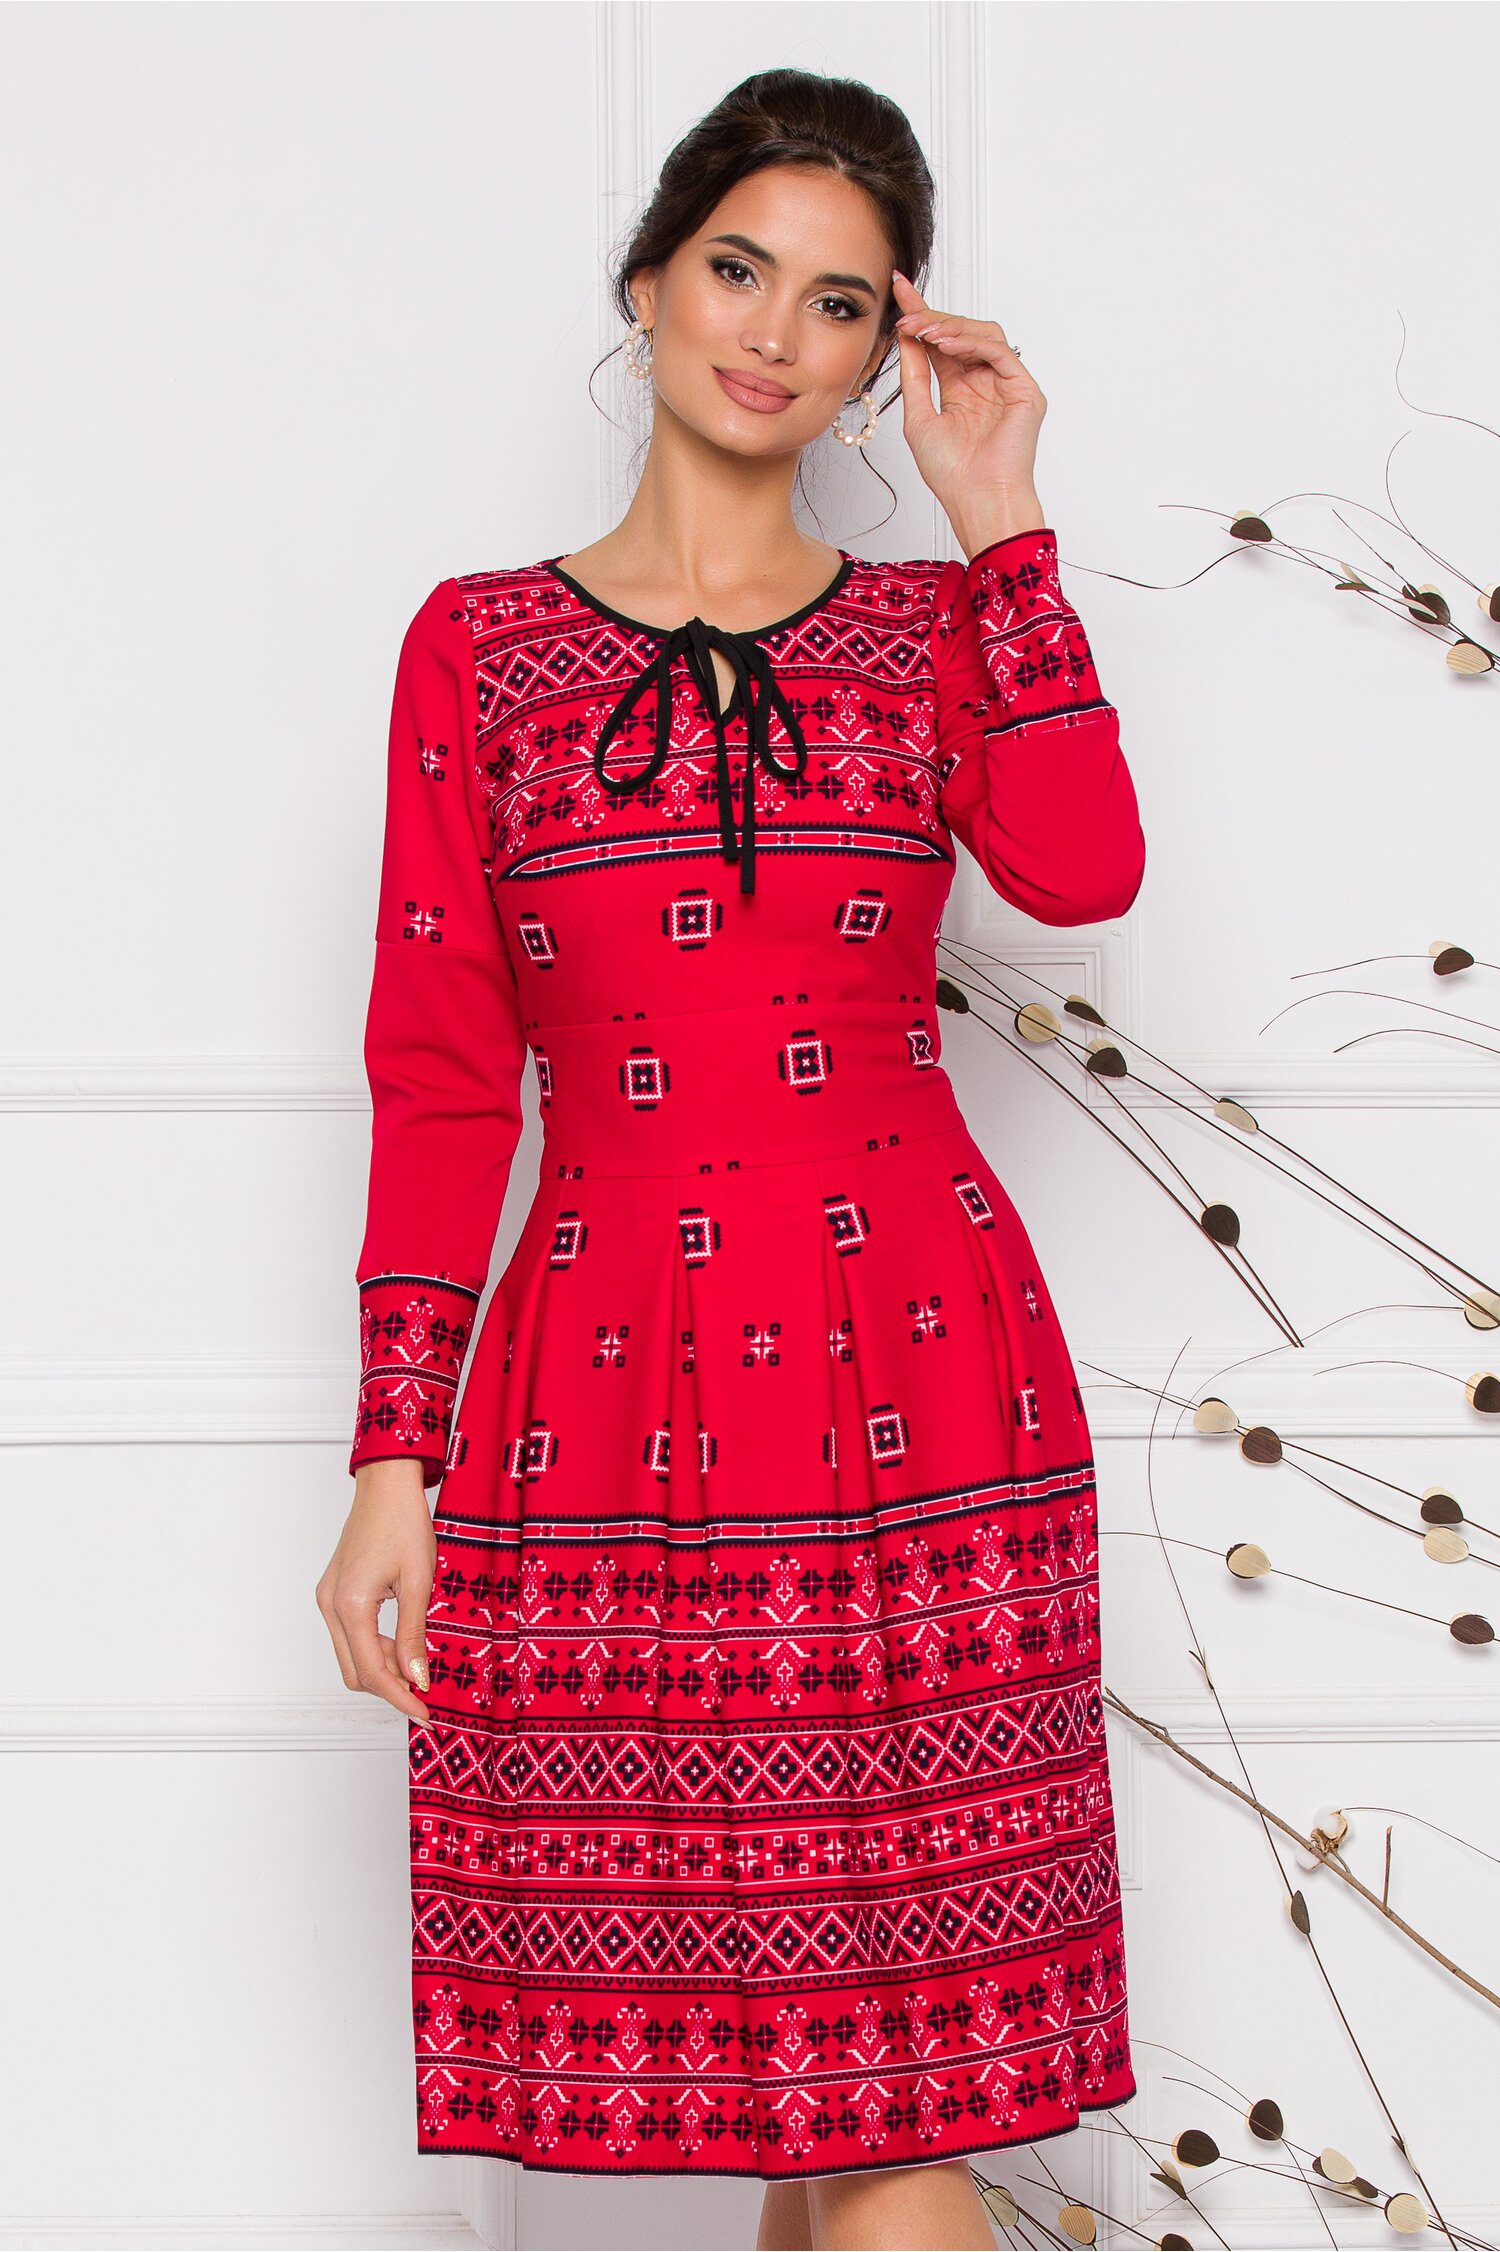 Rochie Moze rosie cu motive traditionale romanesti imagine